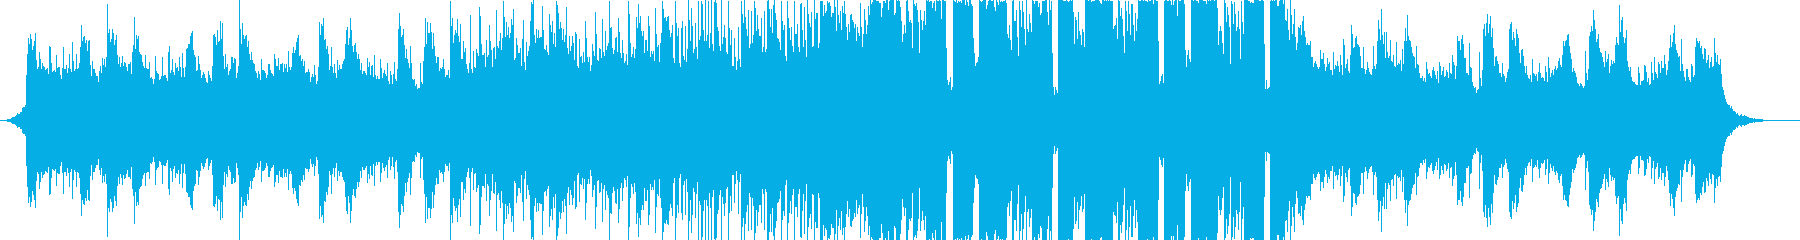 Future Bass 2の再生済みの波形